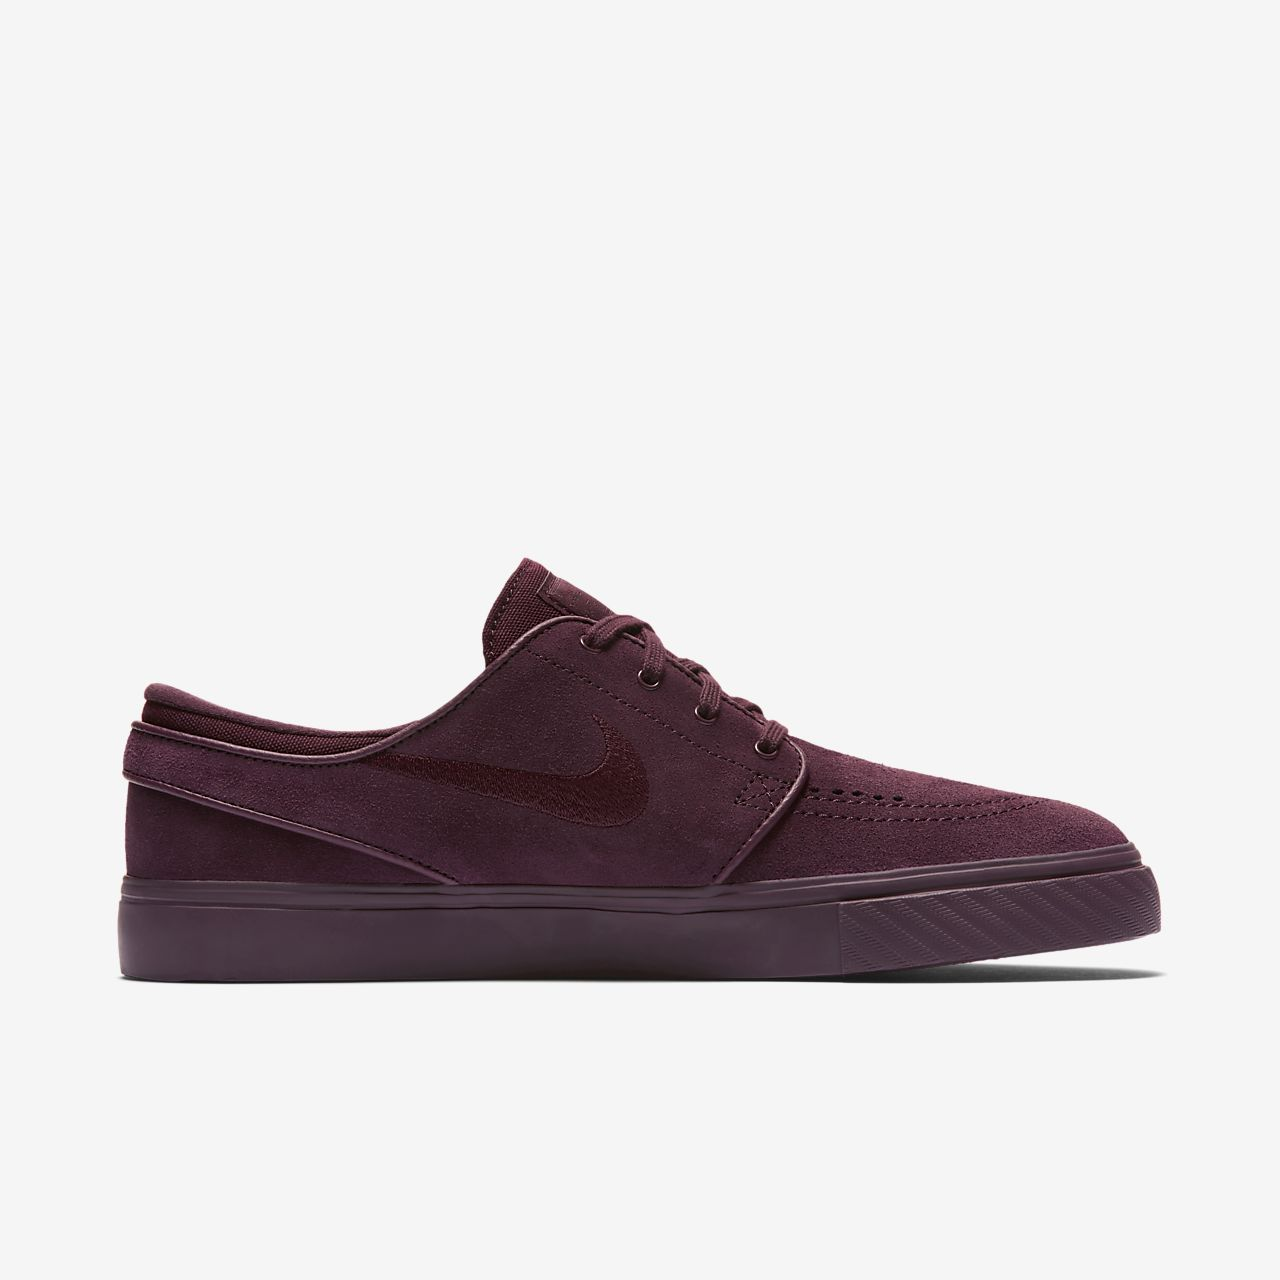 ZOOM STEFAN JANOSKI Sneaker low burgundy crushphantom